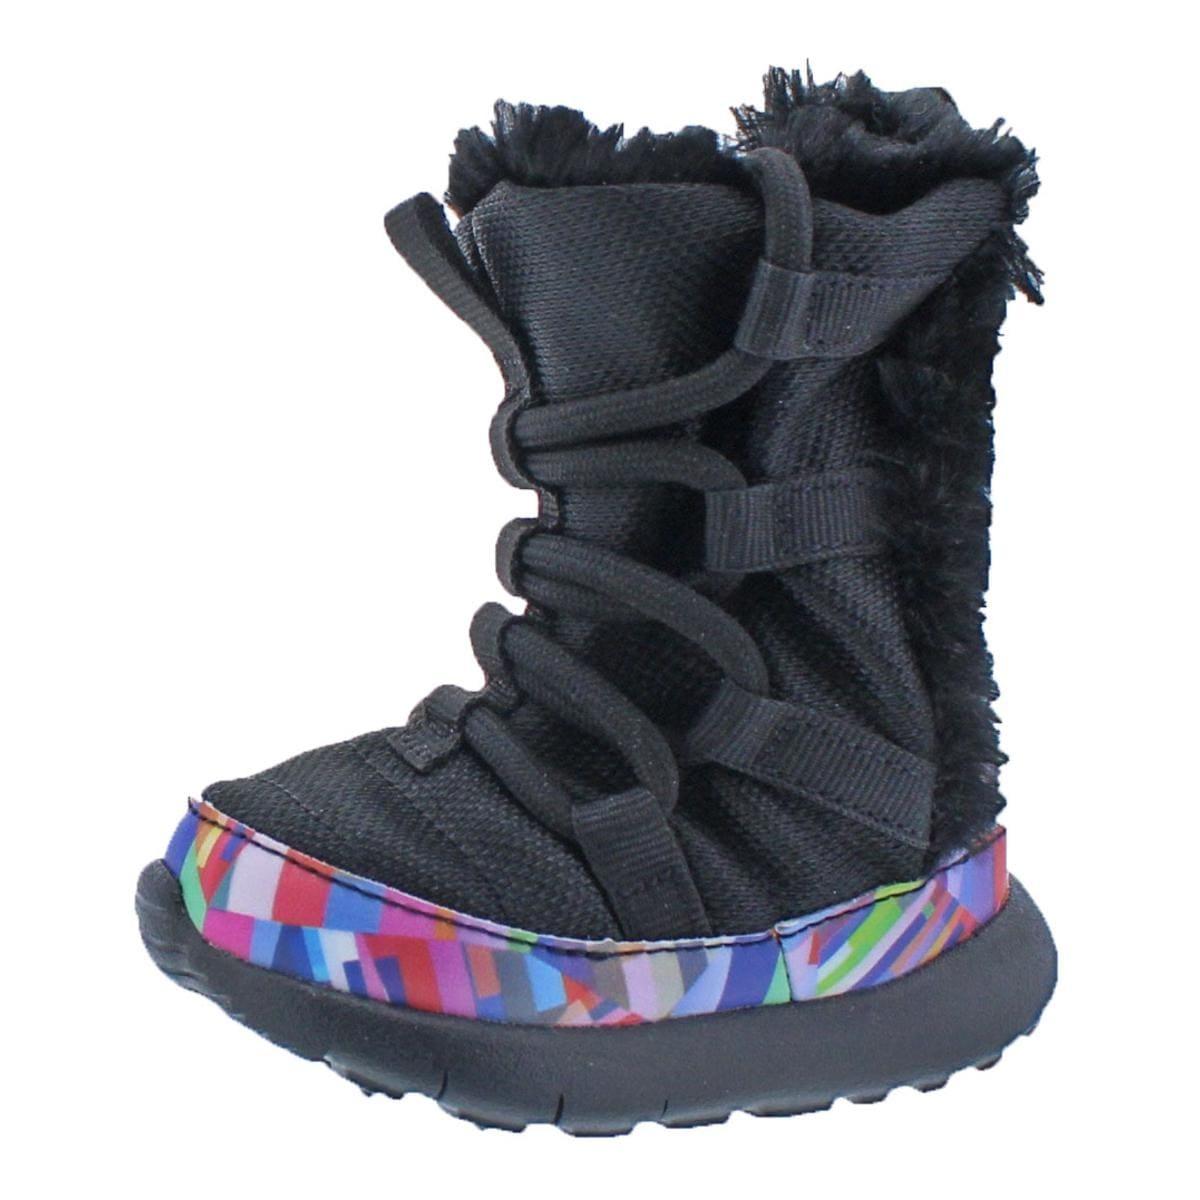 c2ba81b4ac3c ... cheap shop nike roshe one hi print boots infant hightop 3 medium bm  infant free shipping ...